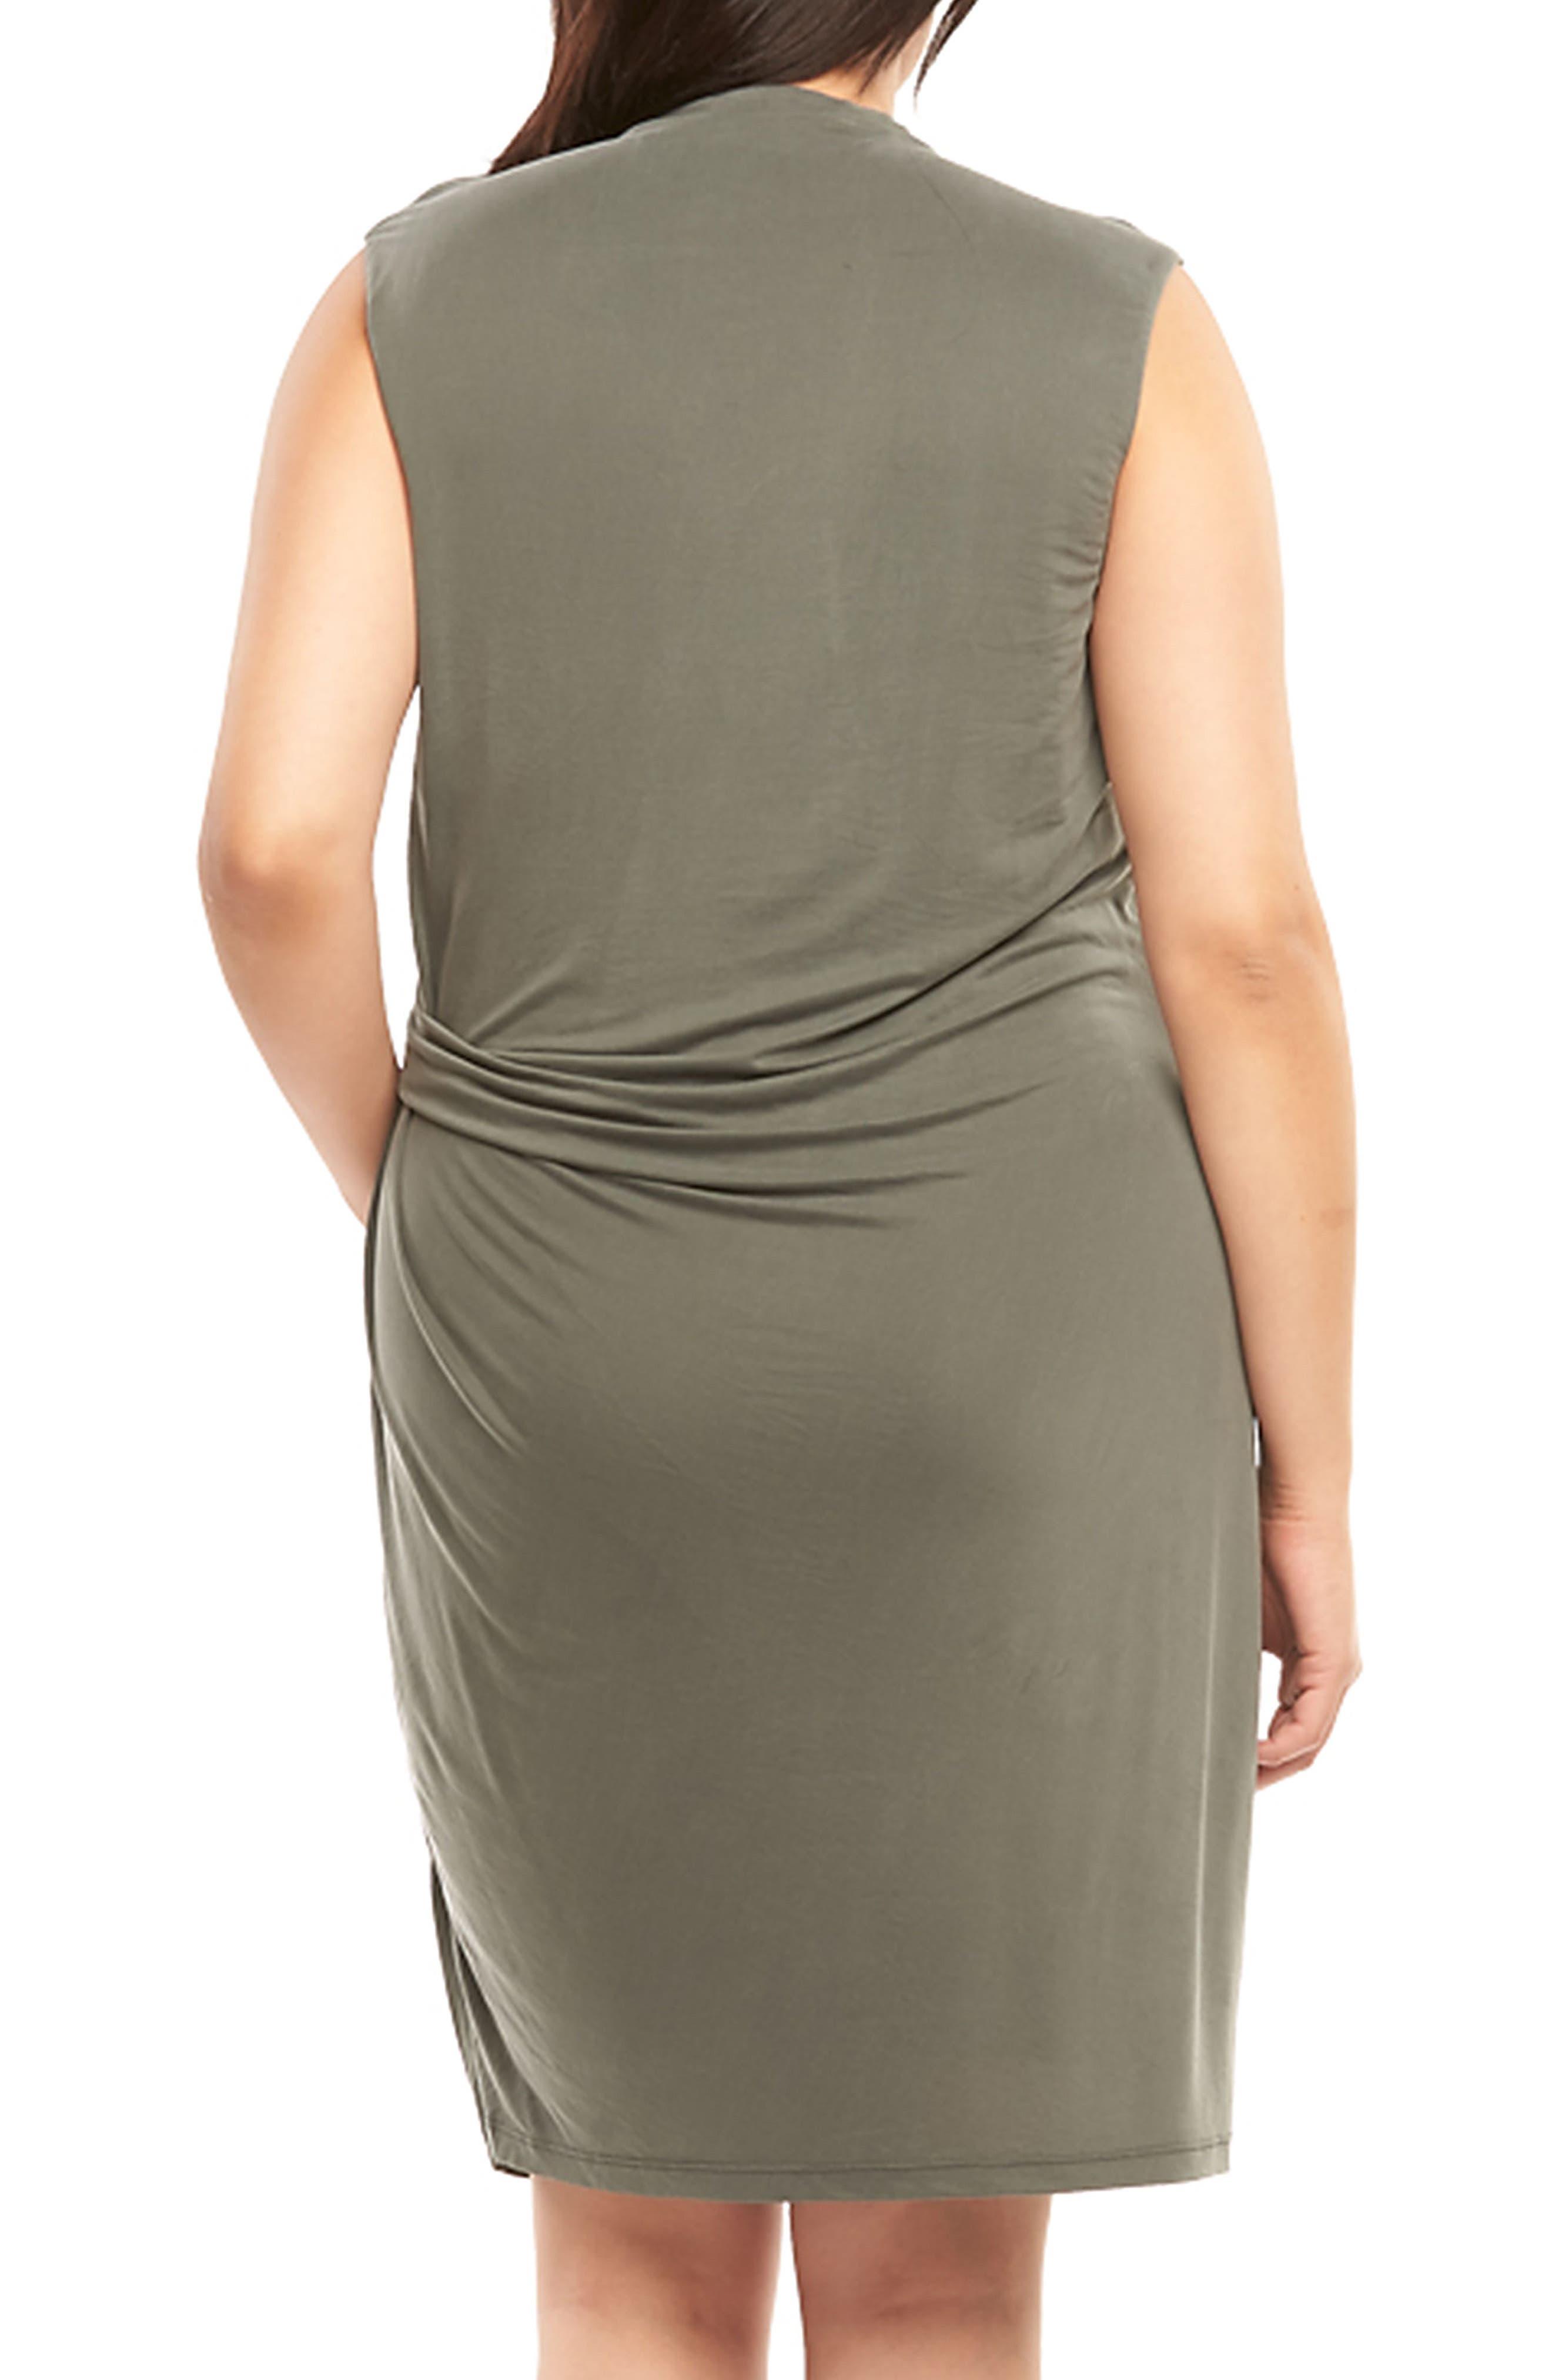 Annetta Ruched Sheath Dress,                             Alternate thumbnail 2, color,                             343